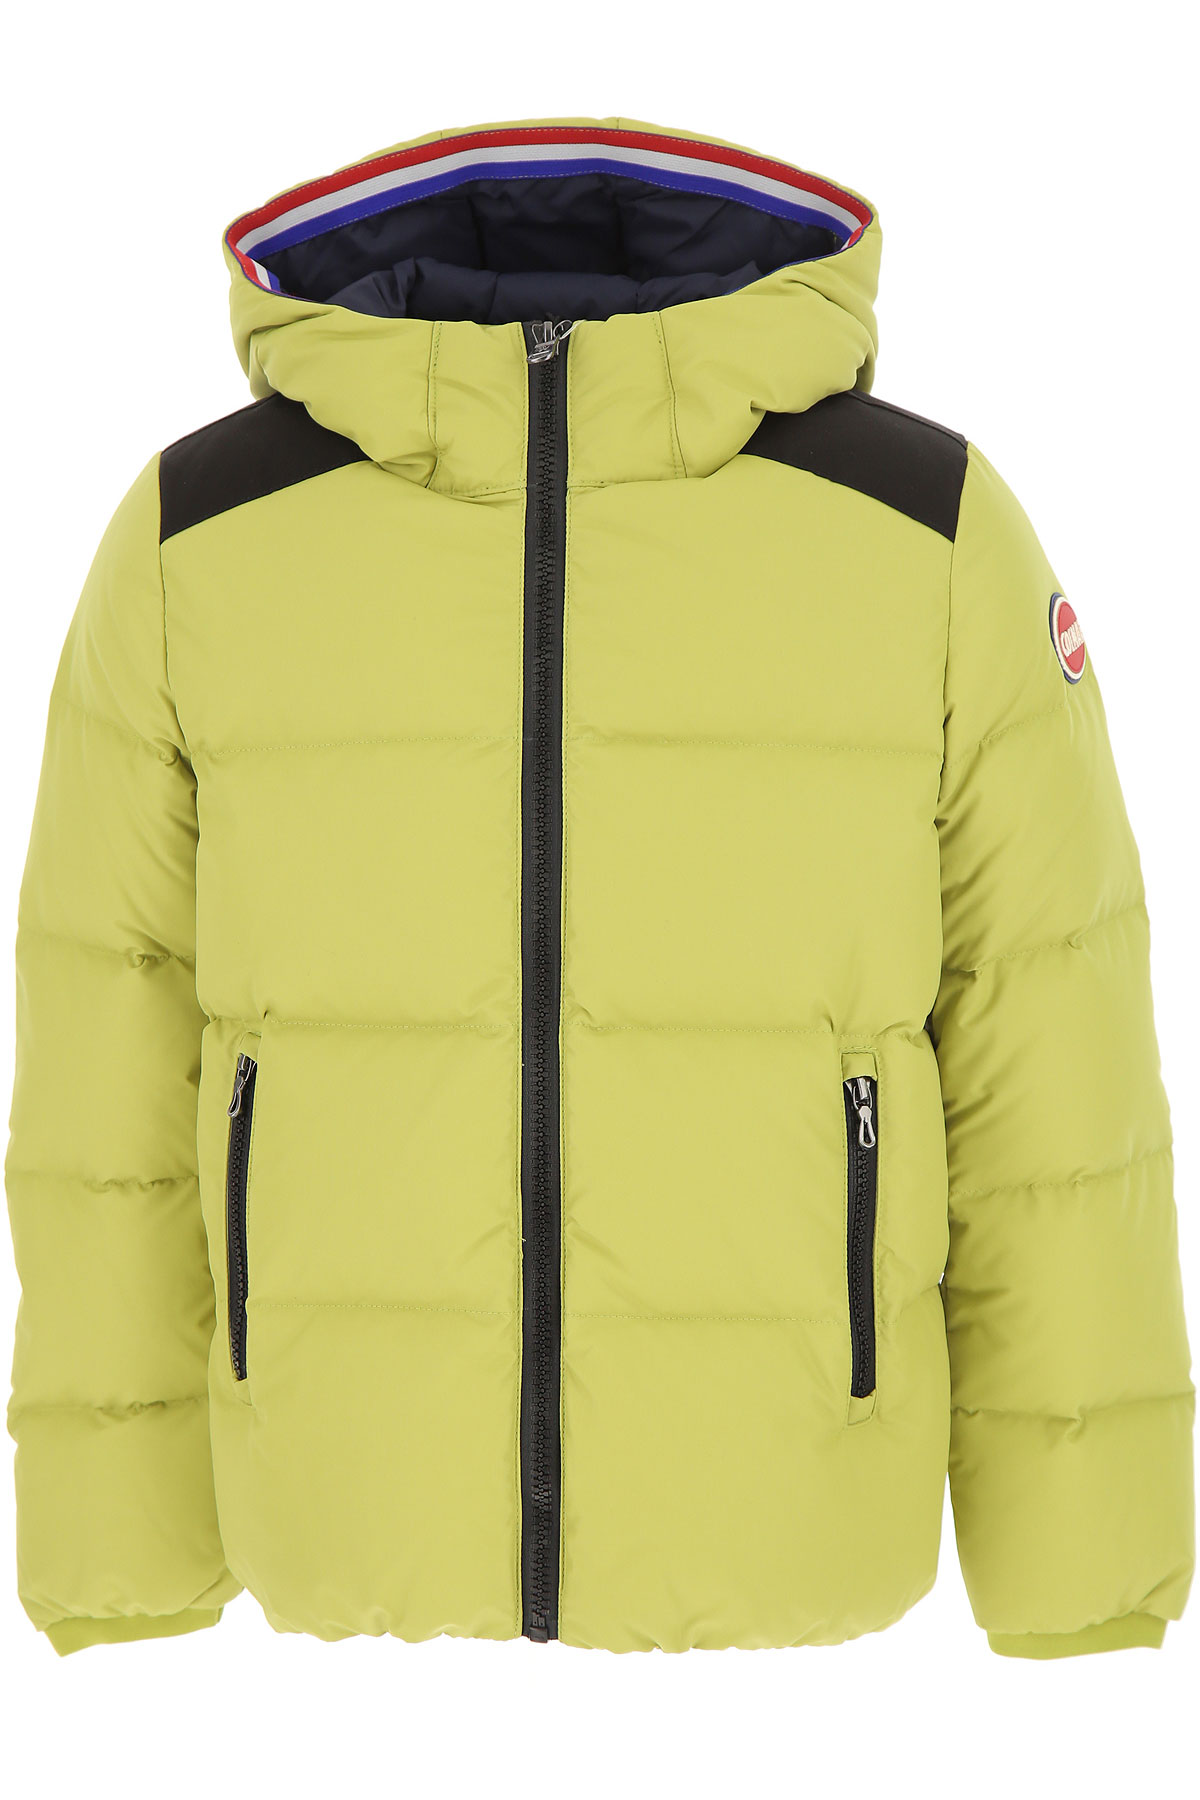 Image of Colmar Boys Down Jacket for Kids, Puffer Ski Jacket, Lime Green, polyamide, 2017, 10Y 14Y 16Y 8Y